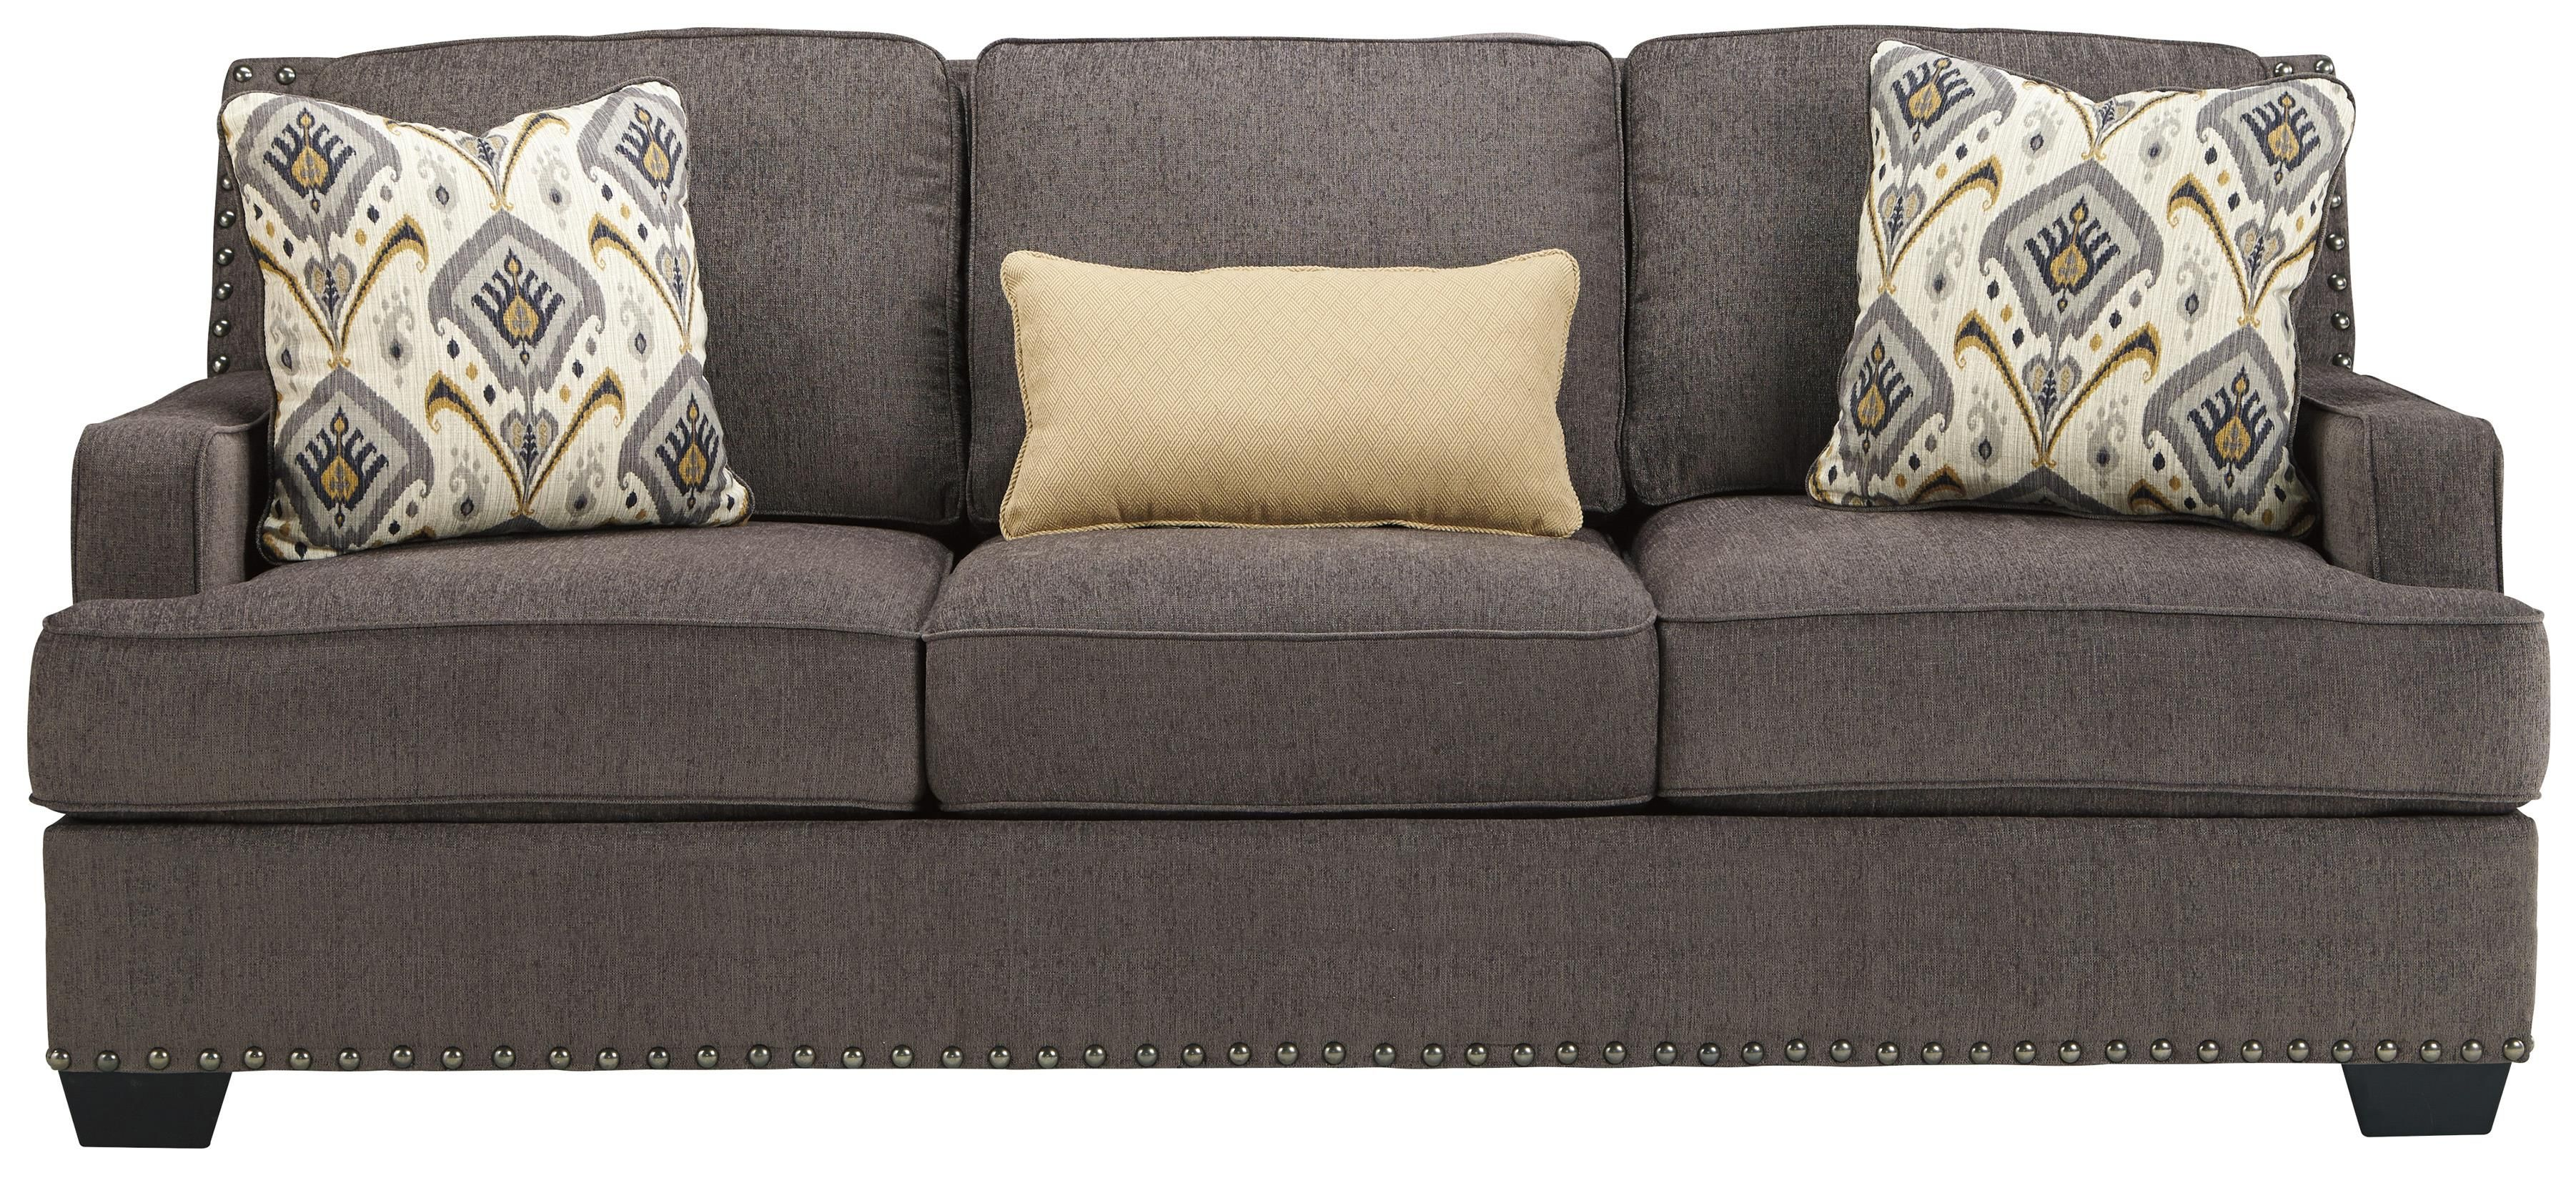 Benchcraft Barinteen Sofa With Track Arms And Nailhead